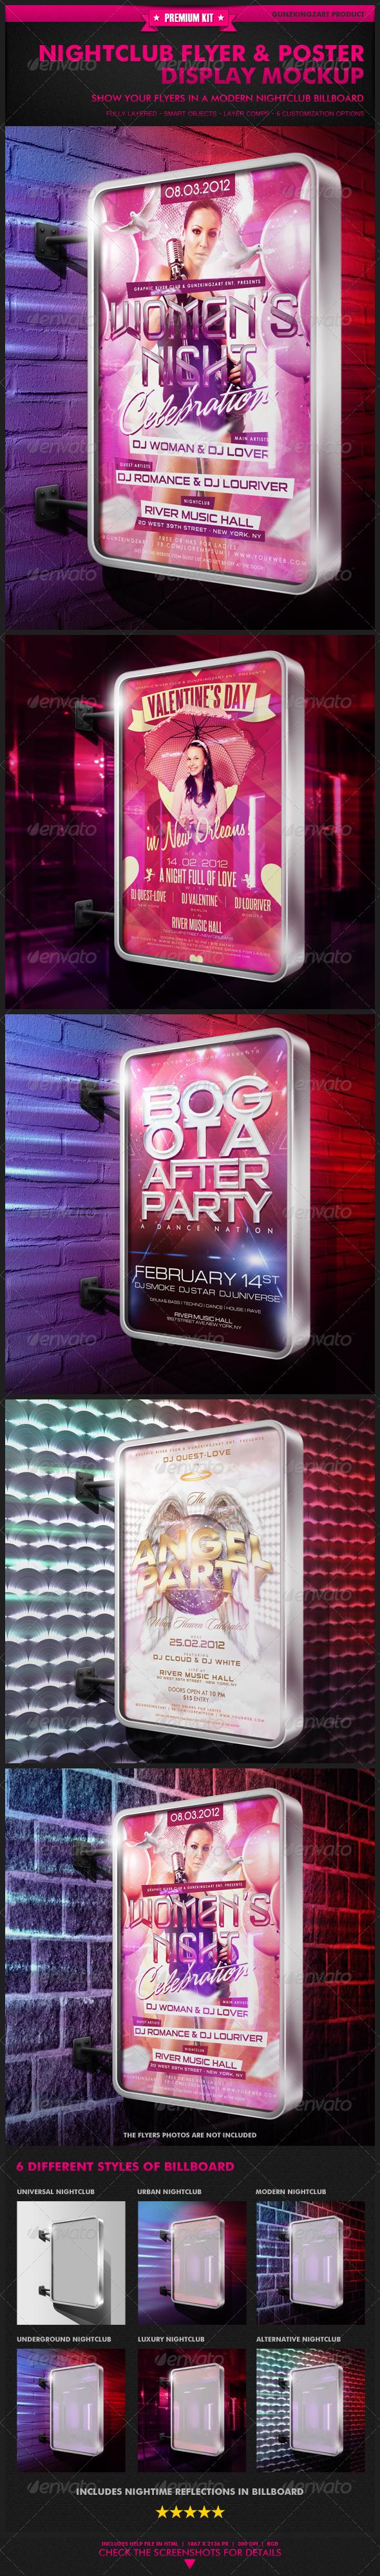 6 poster design photo mockups - Nightclub Flyer Poster Display Mockup